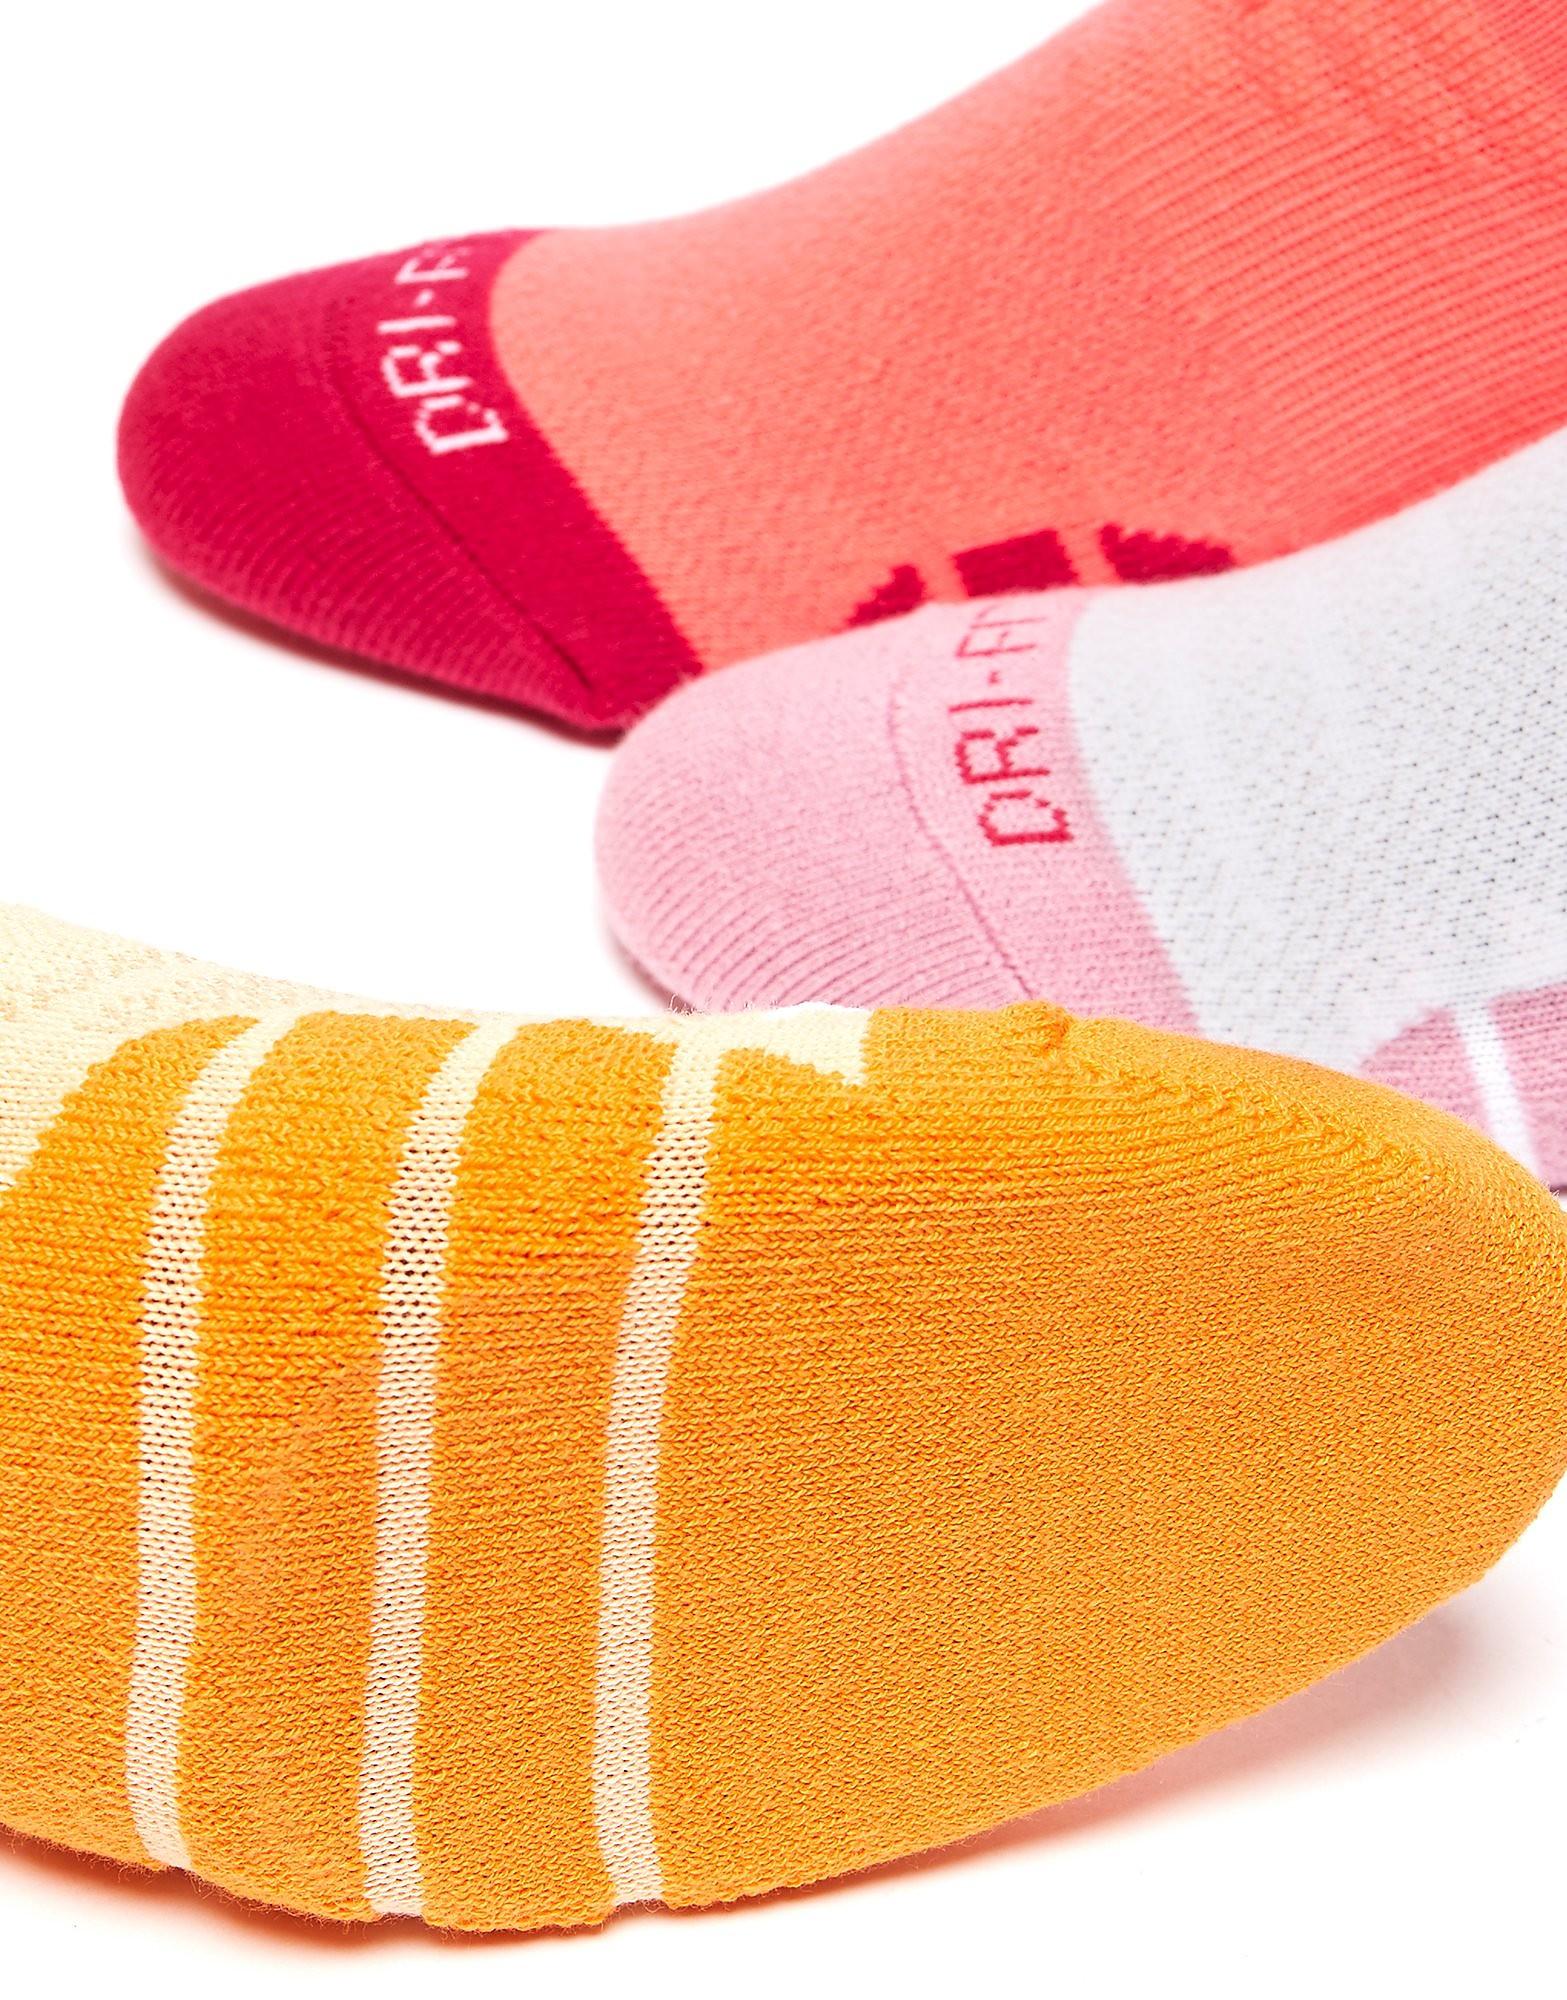 Nike 3 Pack Dri-FIT Socks